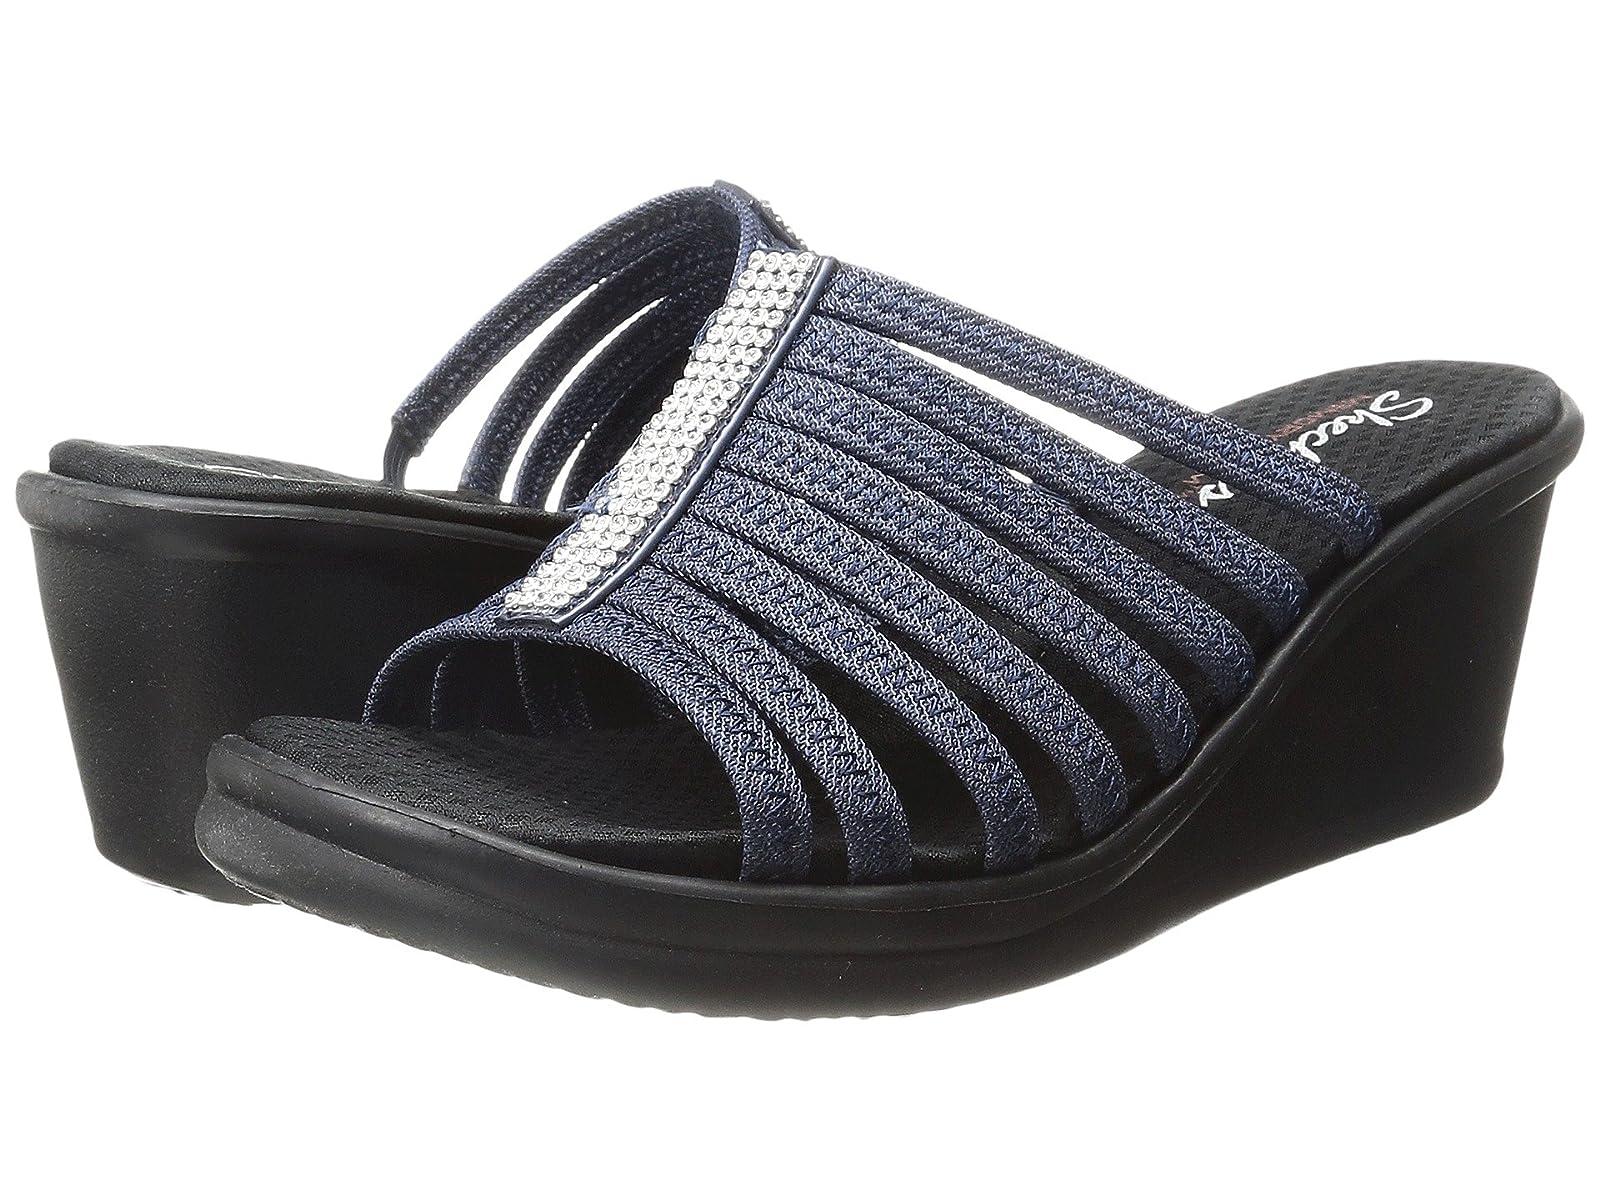 SKECHERS Rumblers - Hot ShotAtmospheric grades have affordable shoes